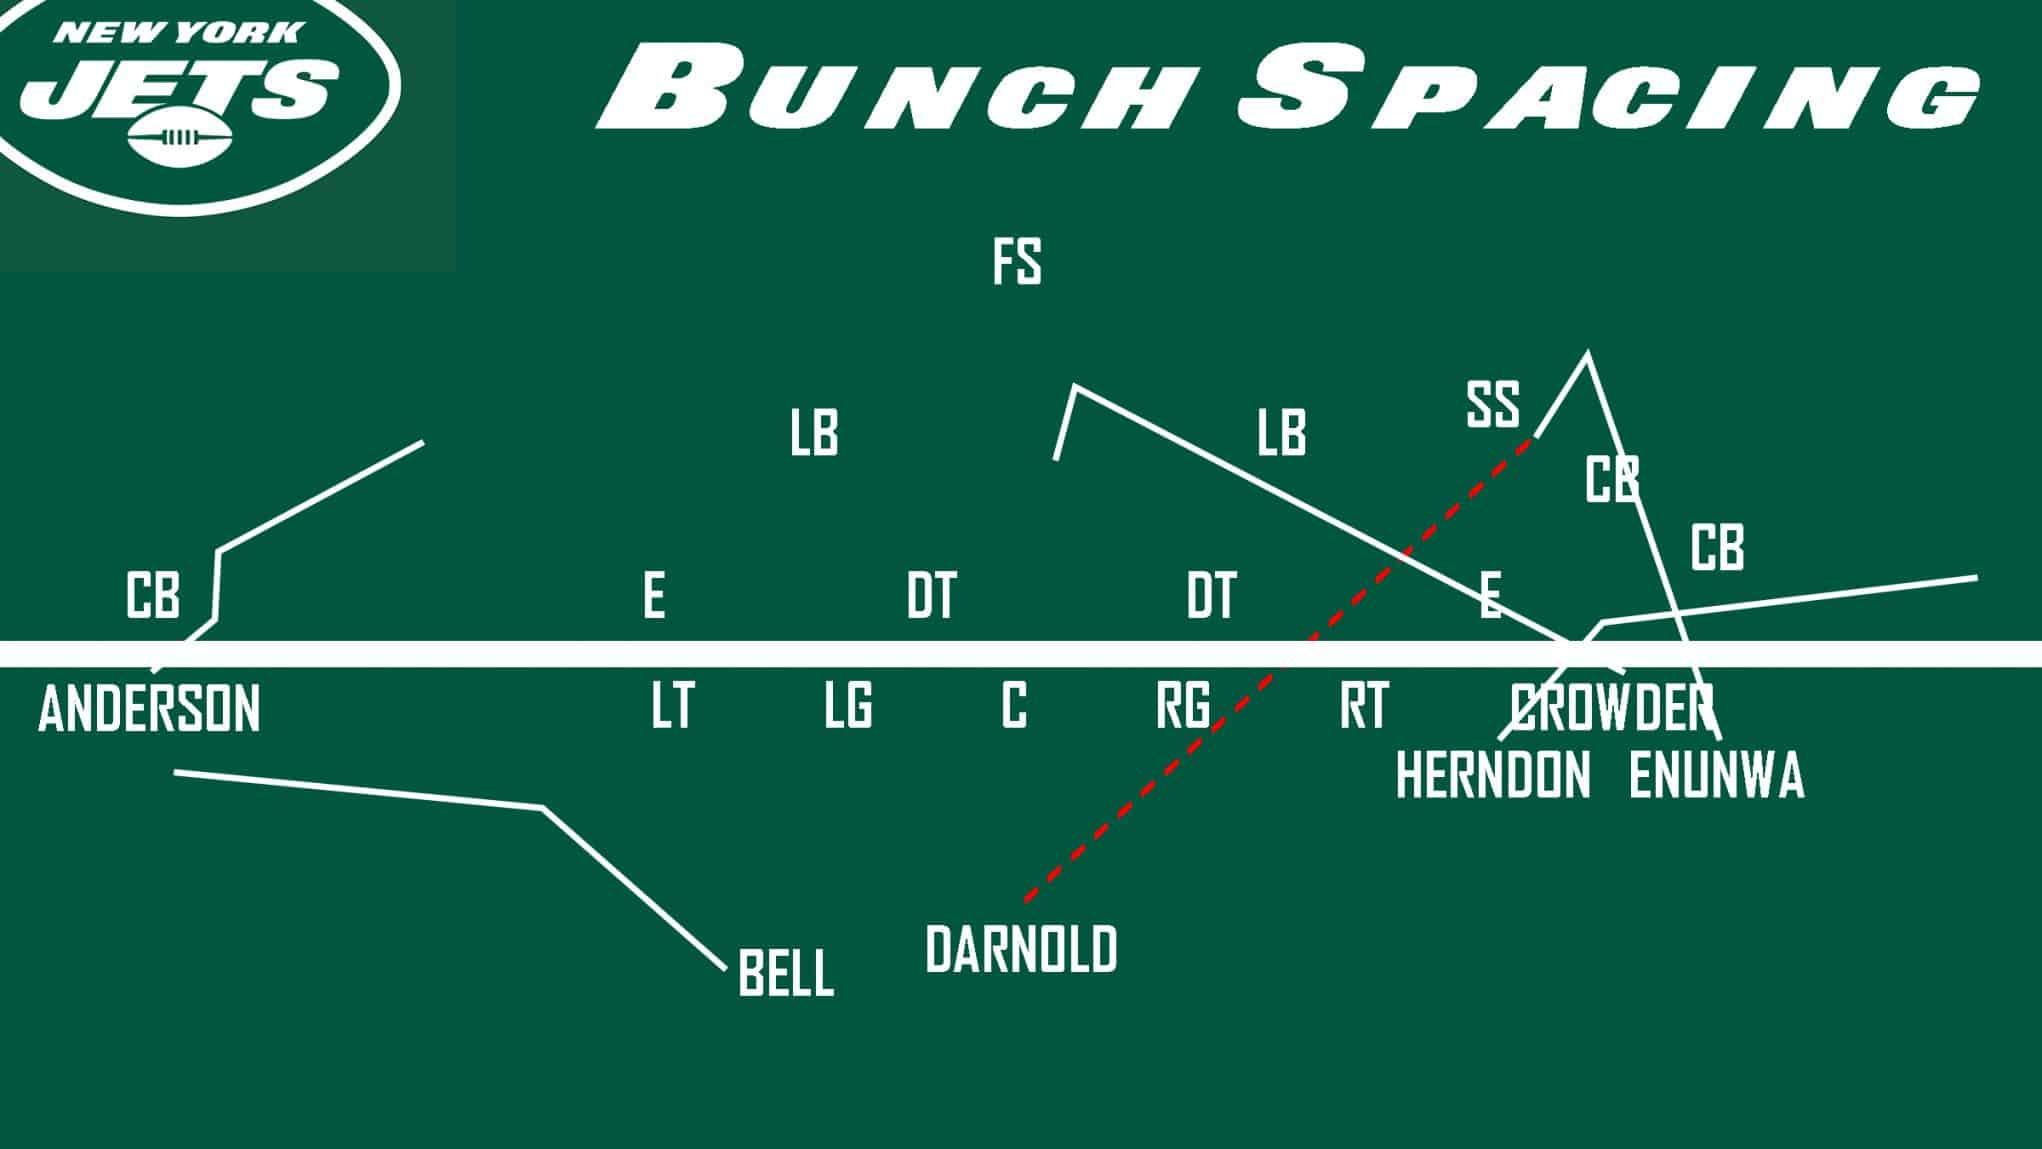 Jets Bunch Spacing